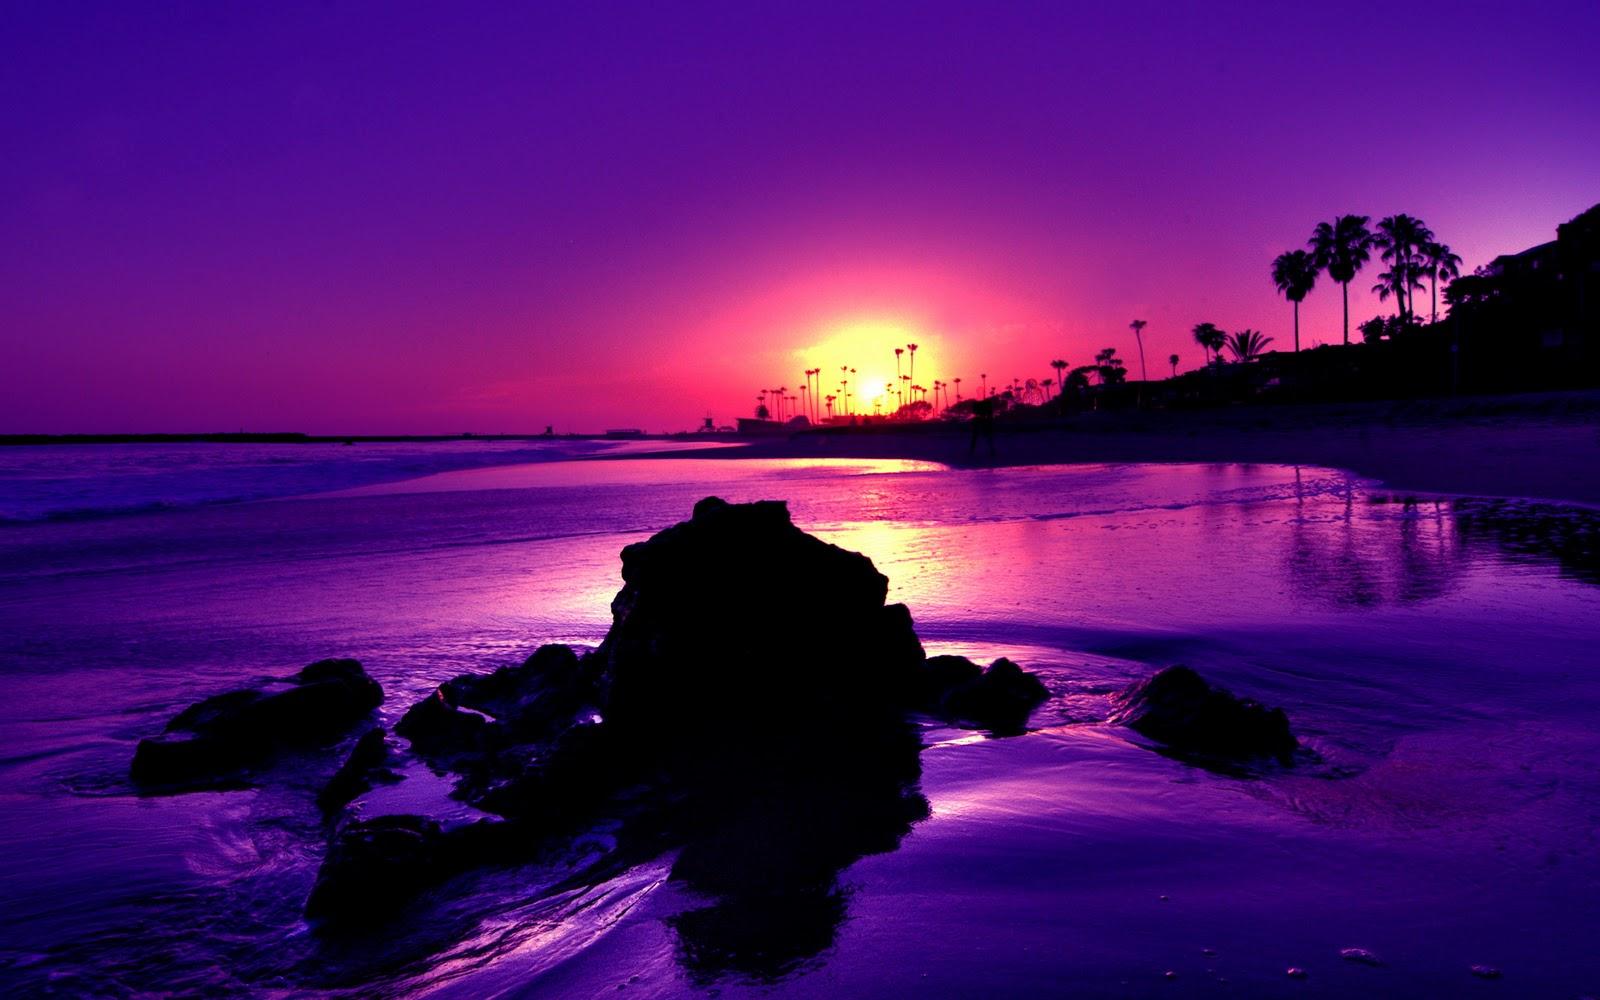 Free Download Beautiful Beach Sunset Wallpaper 9339 Hd